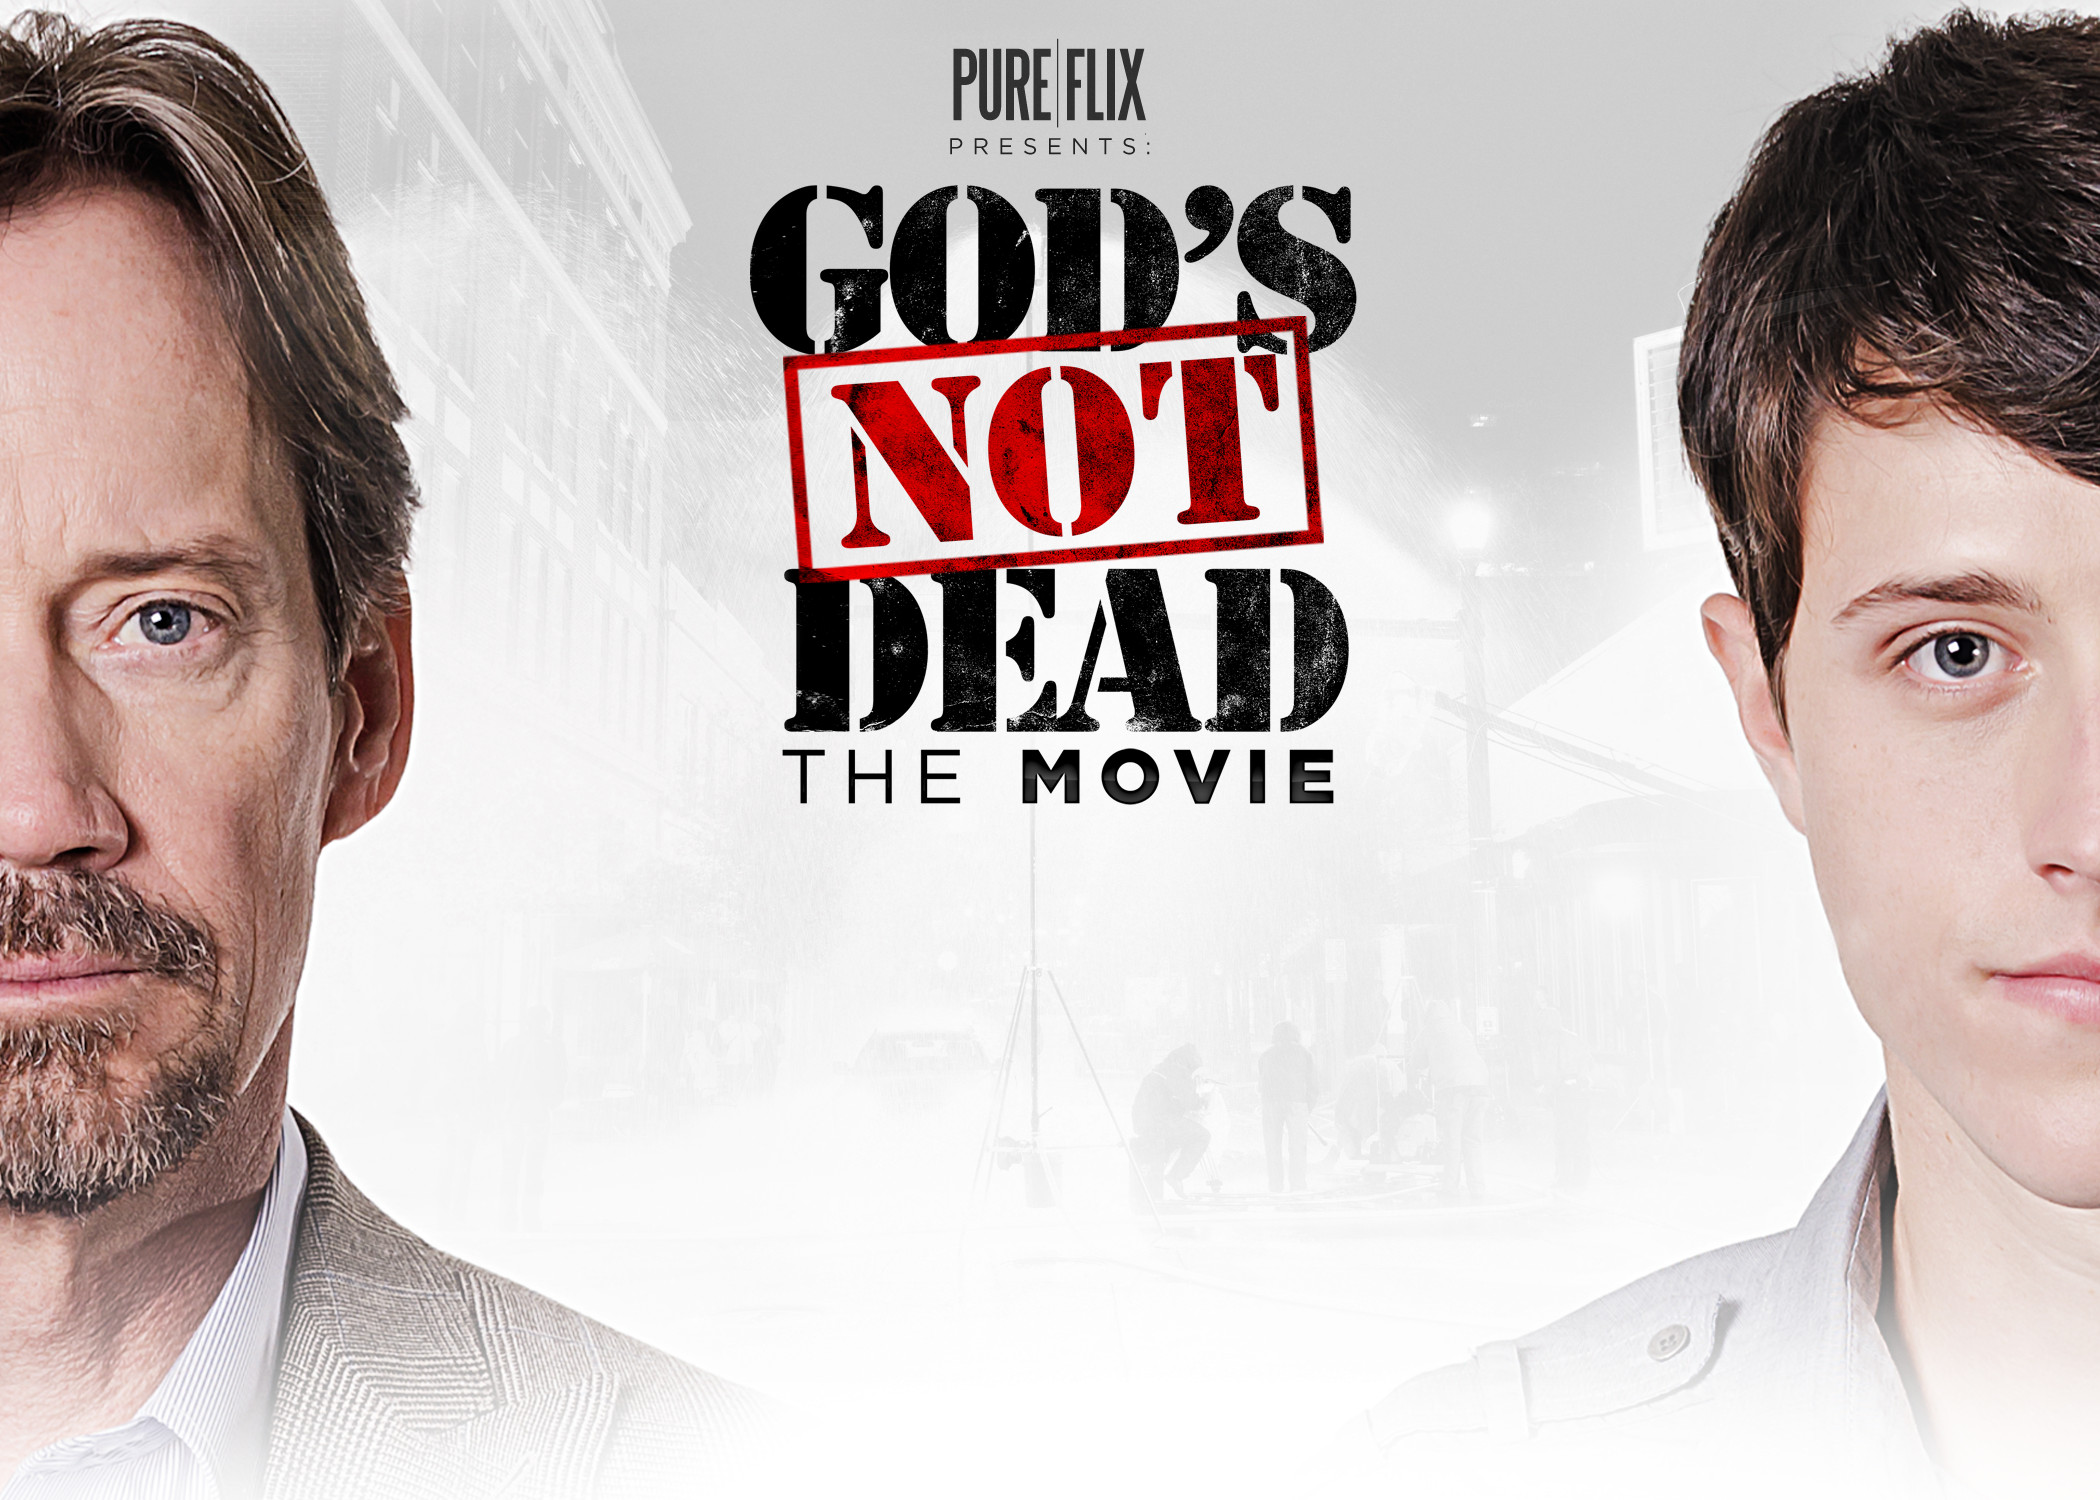 Are Faith-Based Movies Doomed?